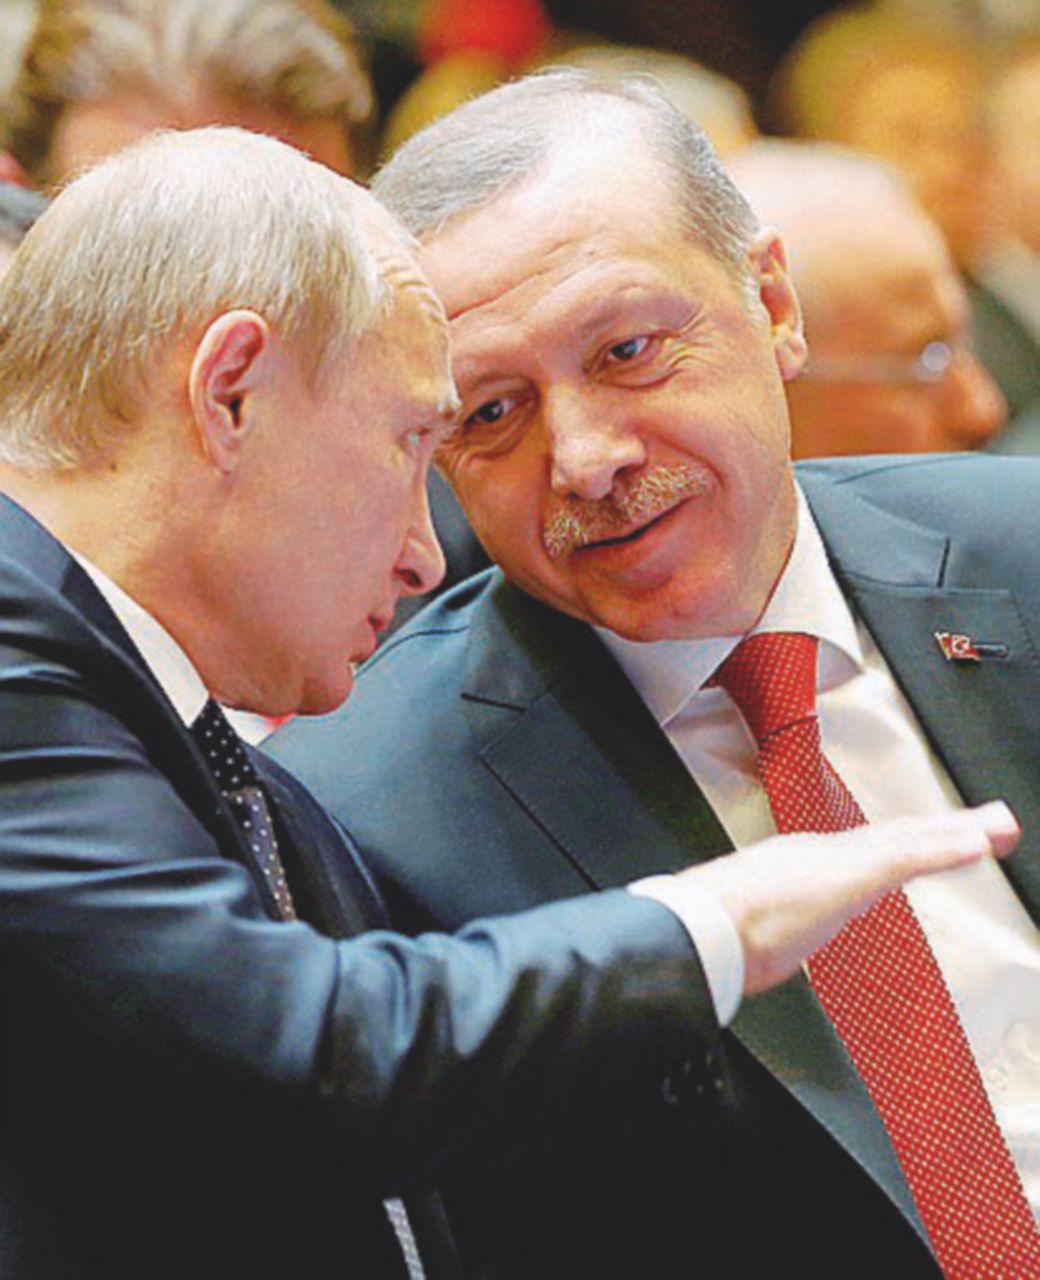 Messaggio di piombo a Putin e Erdogan